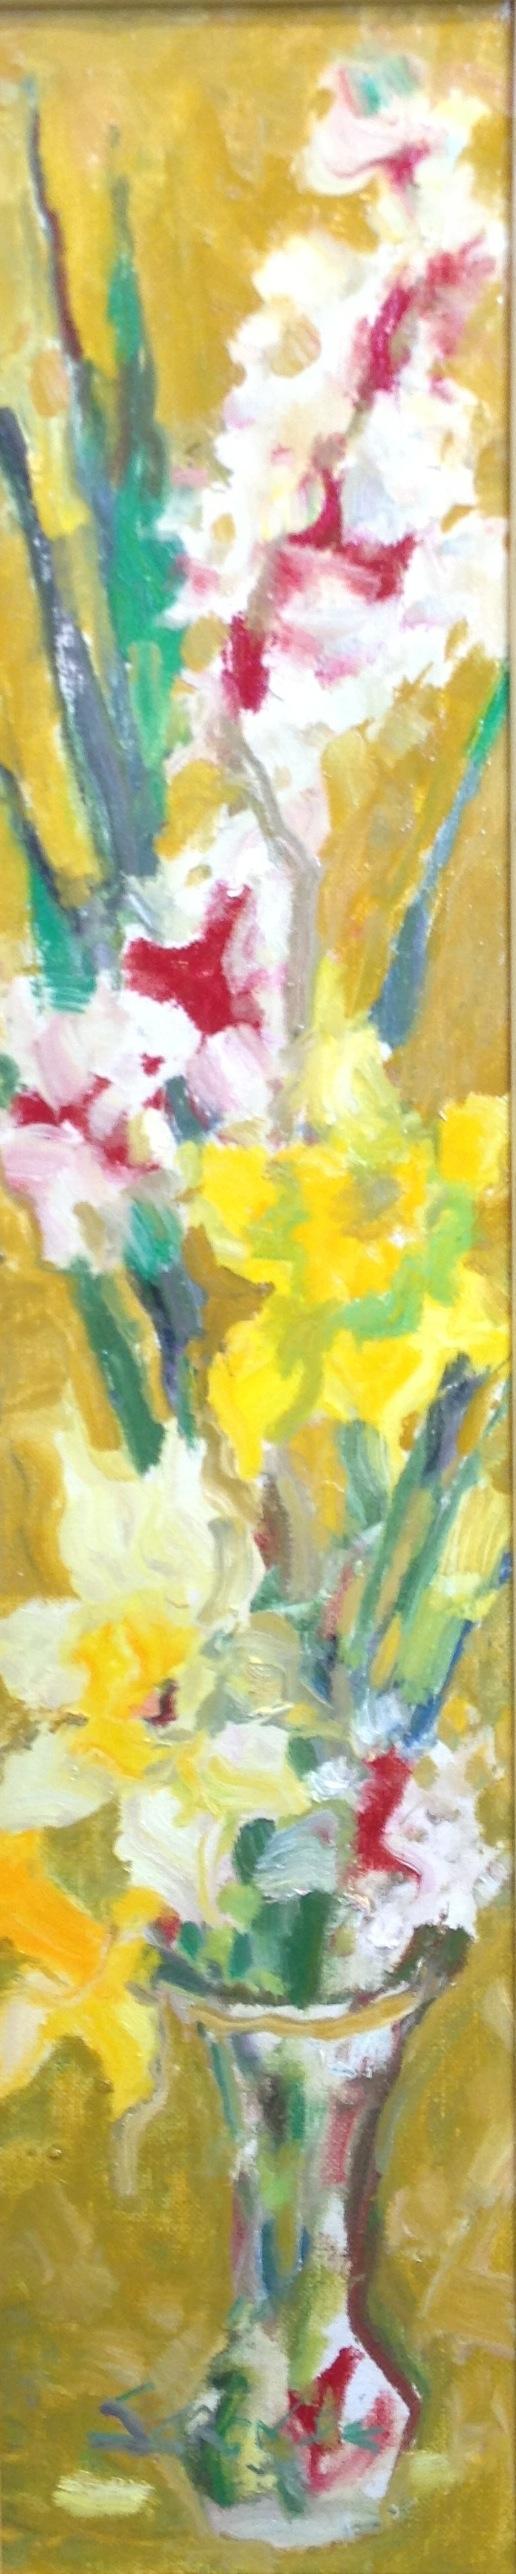 Sunny Bouquet by  Adele Seronde - Masterpiece Online